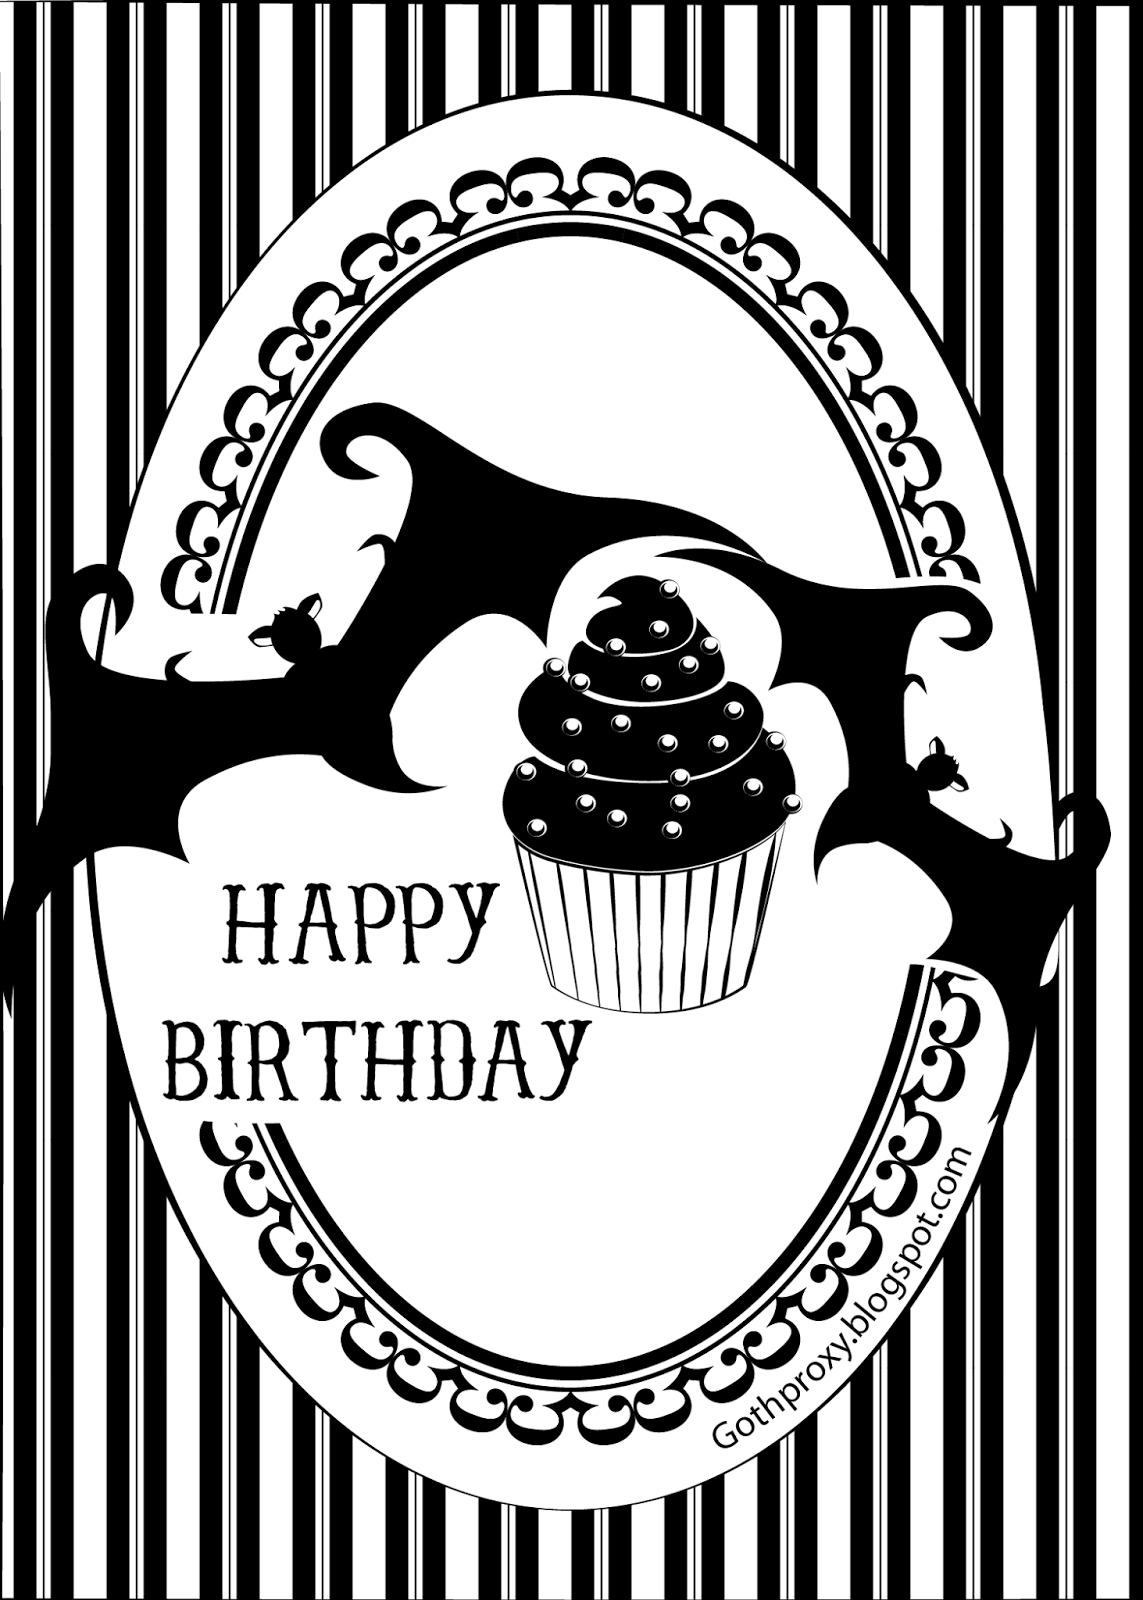 Goth proxy its my birthday today its my birthday today bookmarktalkfo Choice Image